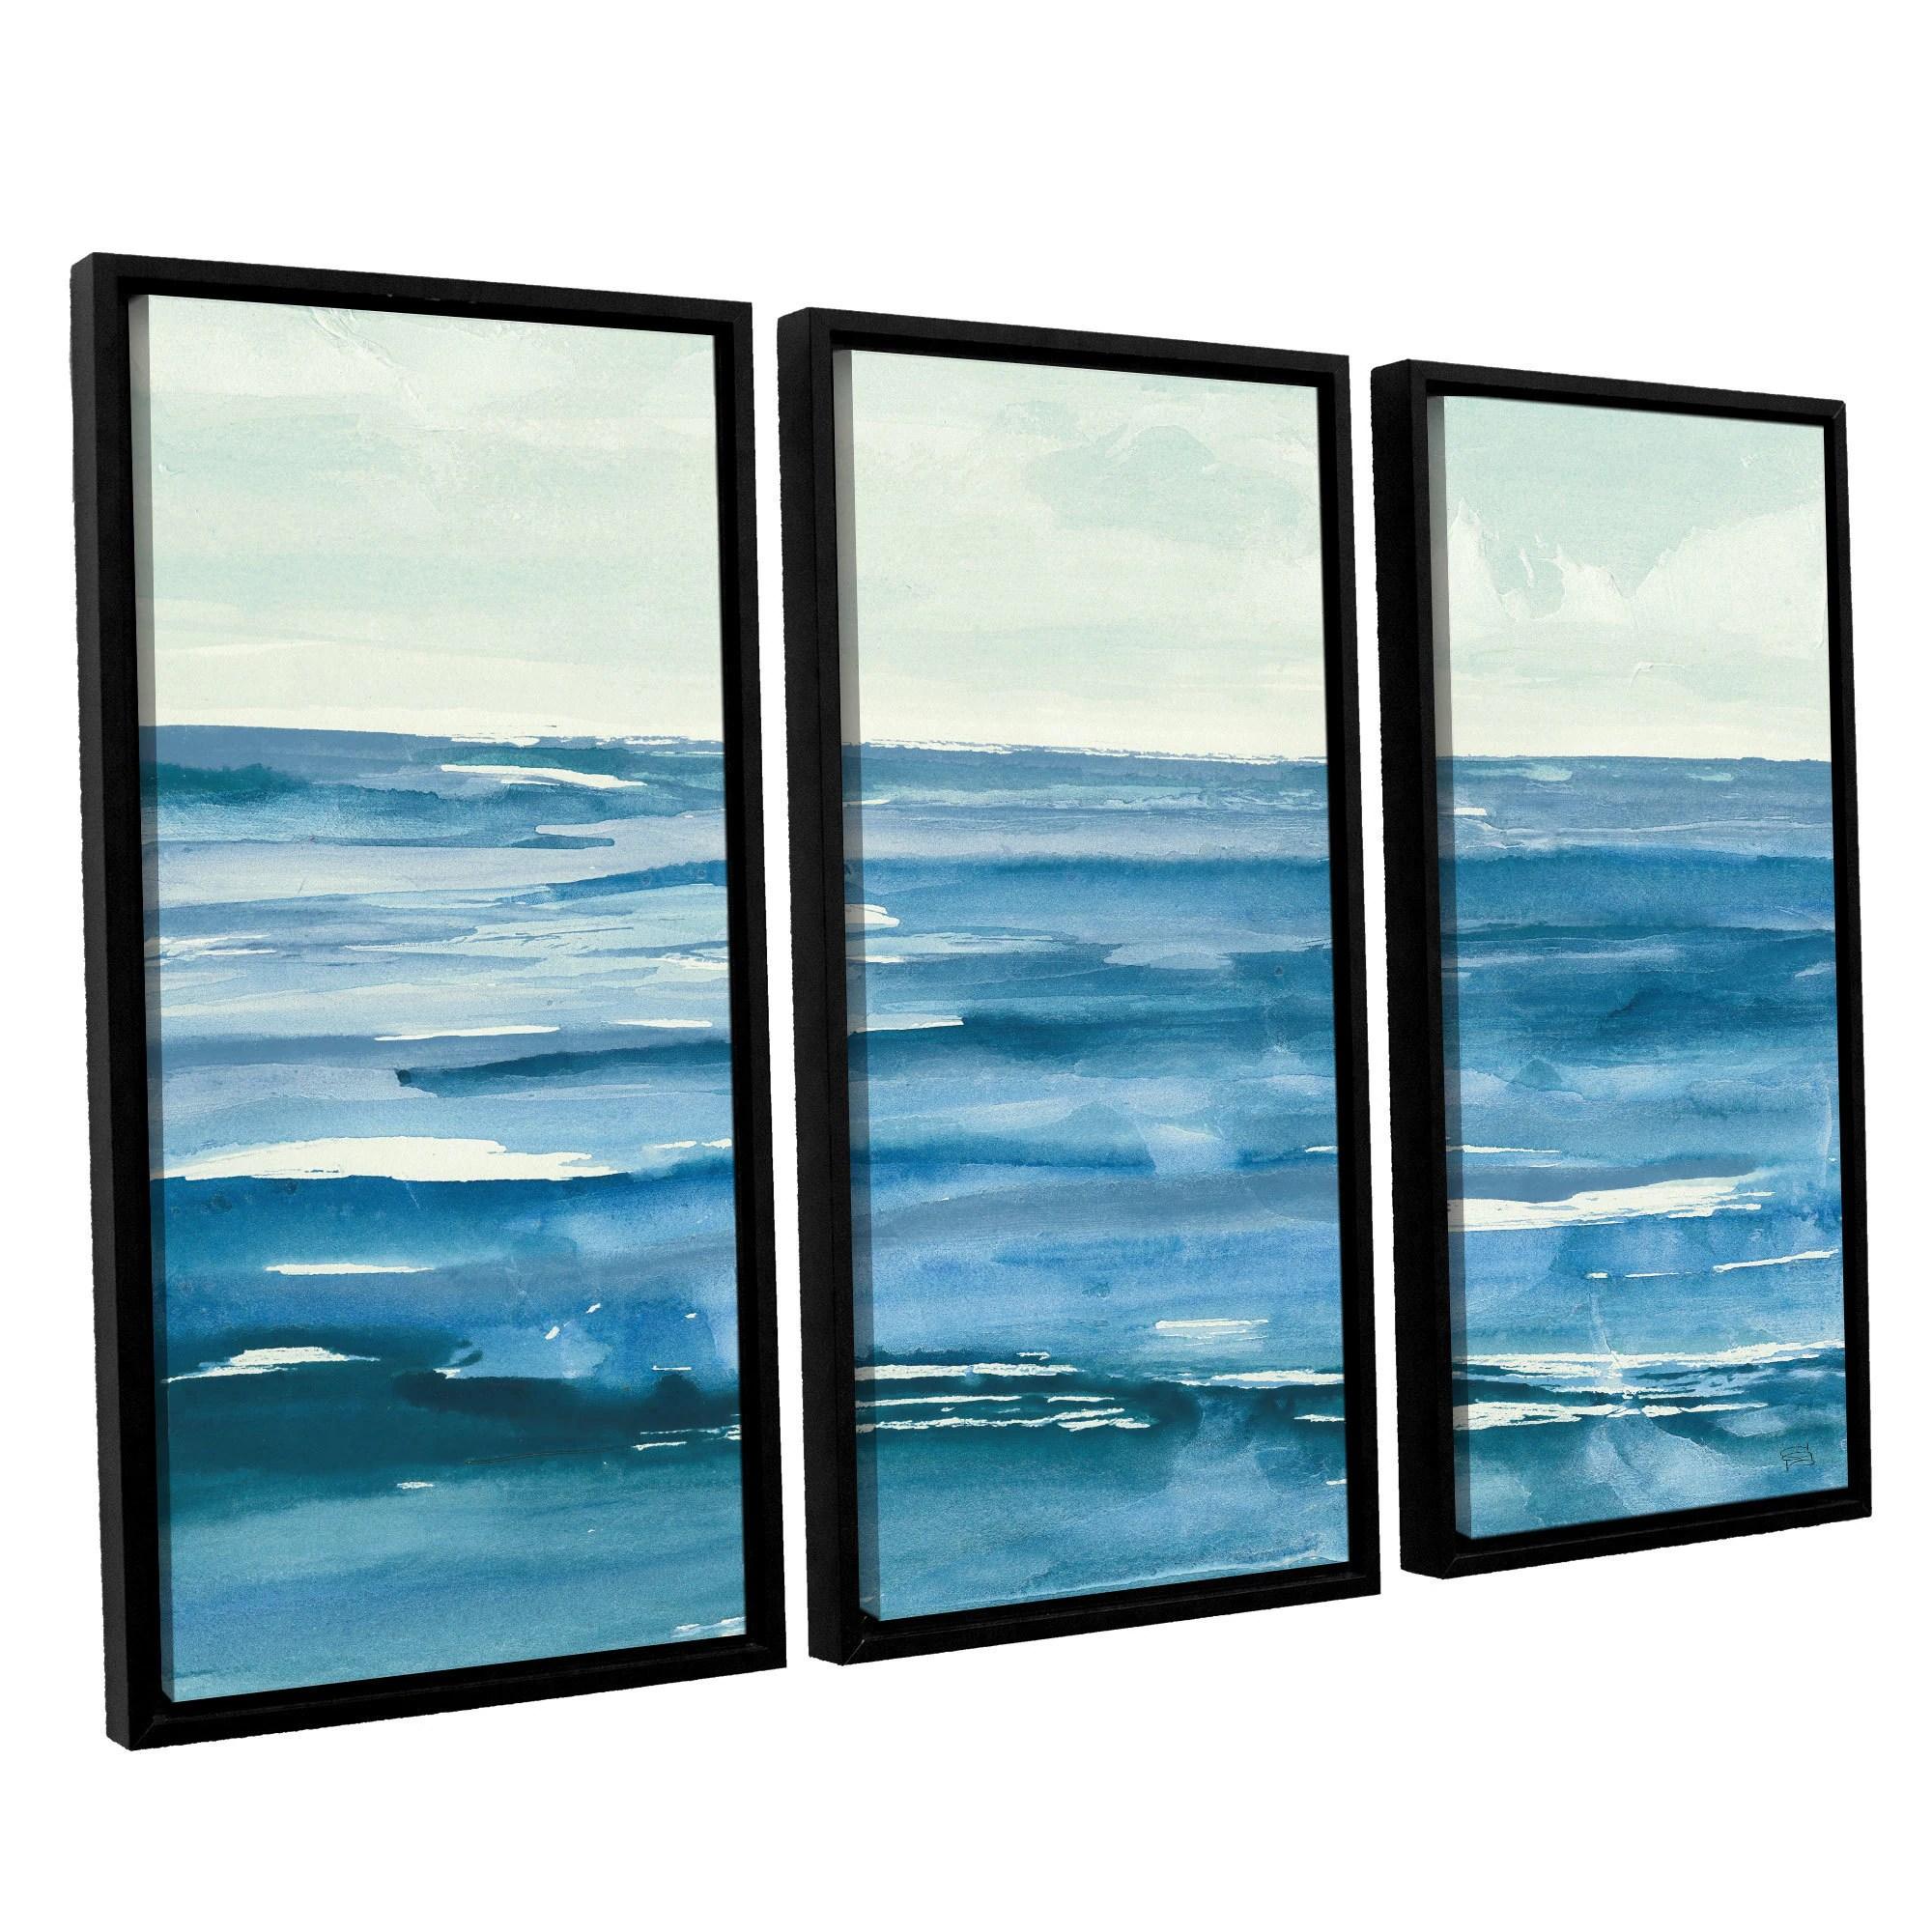 Chris Paschke's 'Seascape III' 3 Piece Floater Framed Canvas Set